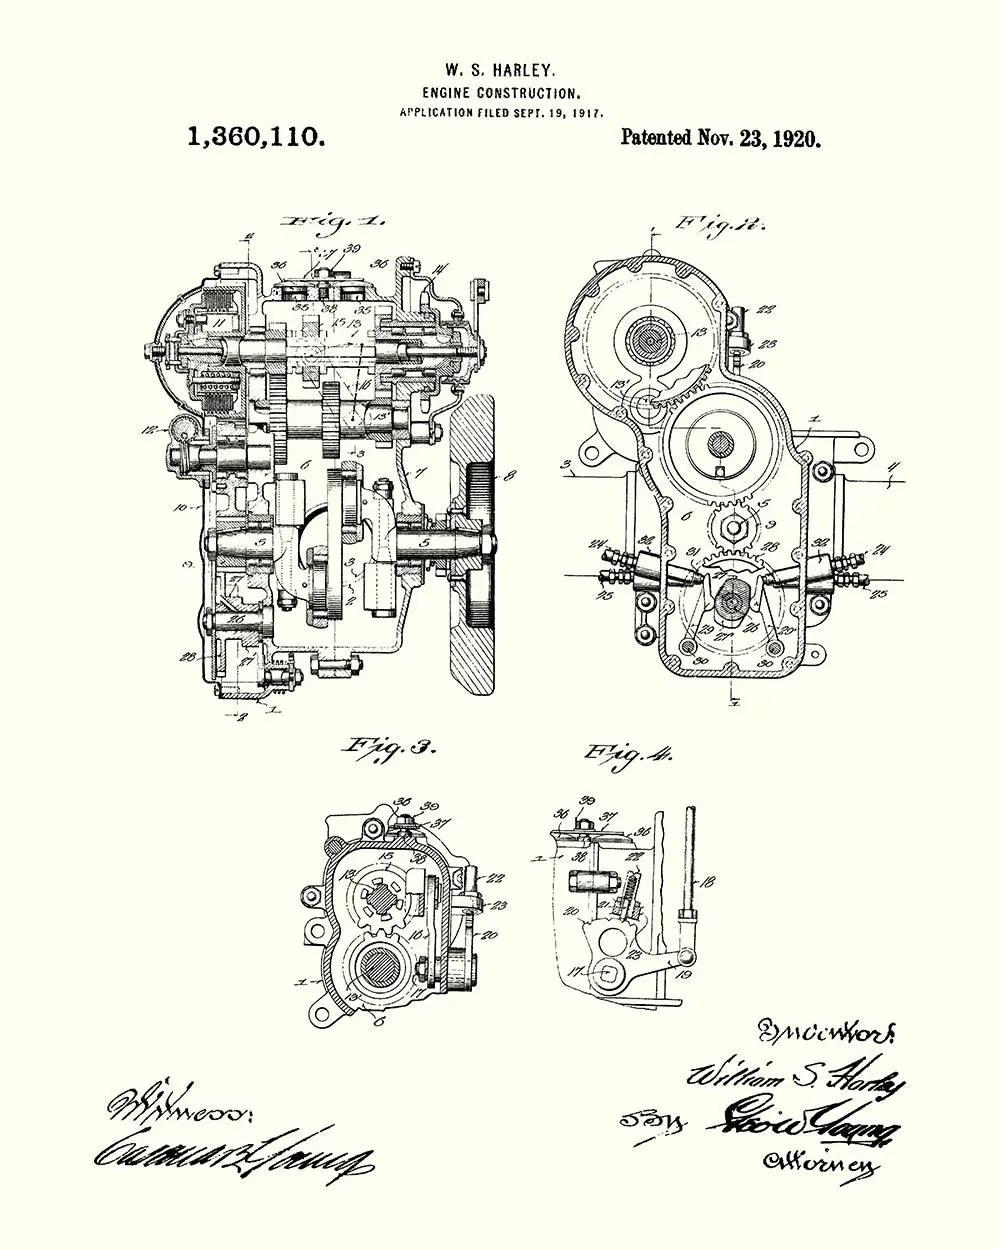 hight resolution of harley engine construction patent art print harley davidson motorcycle engine patent art print harley davidson patent print